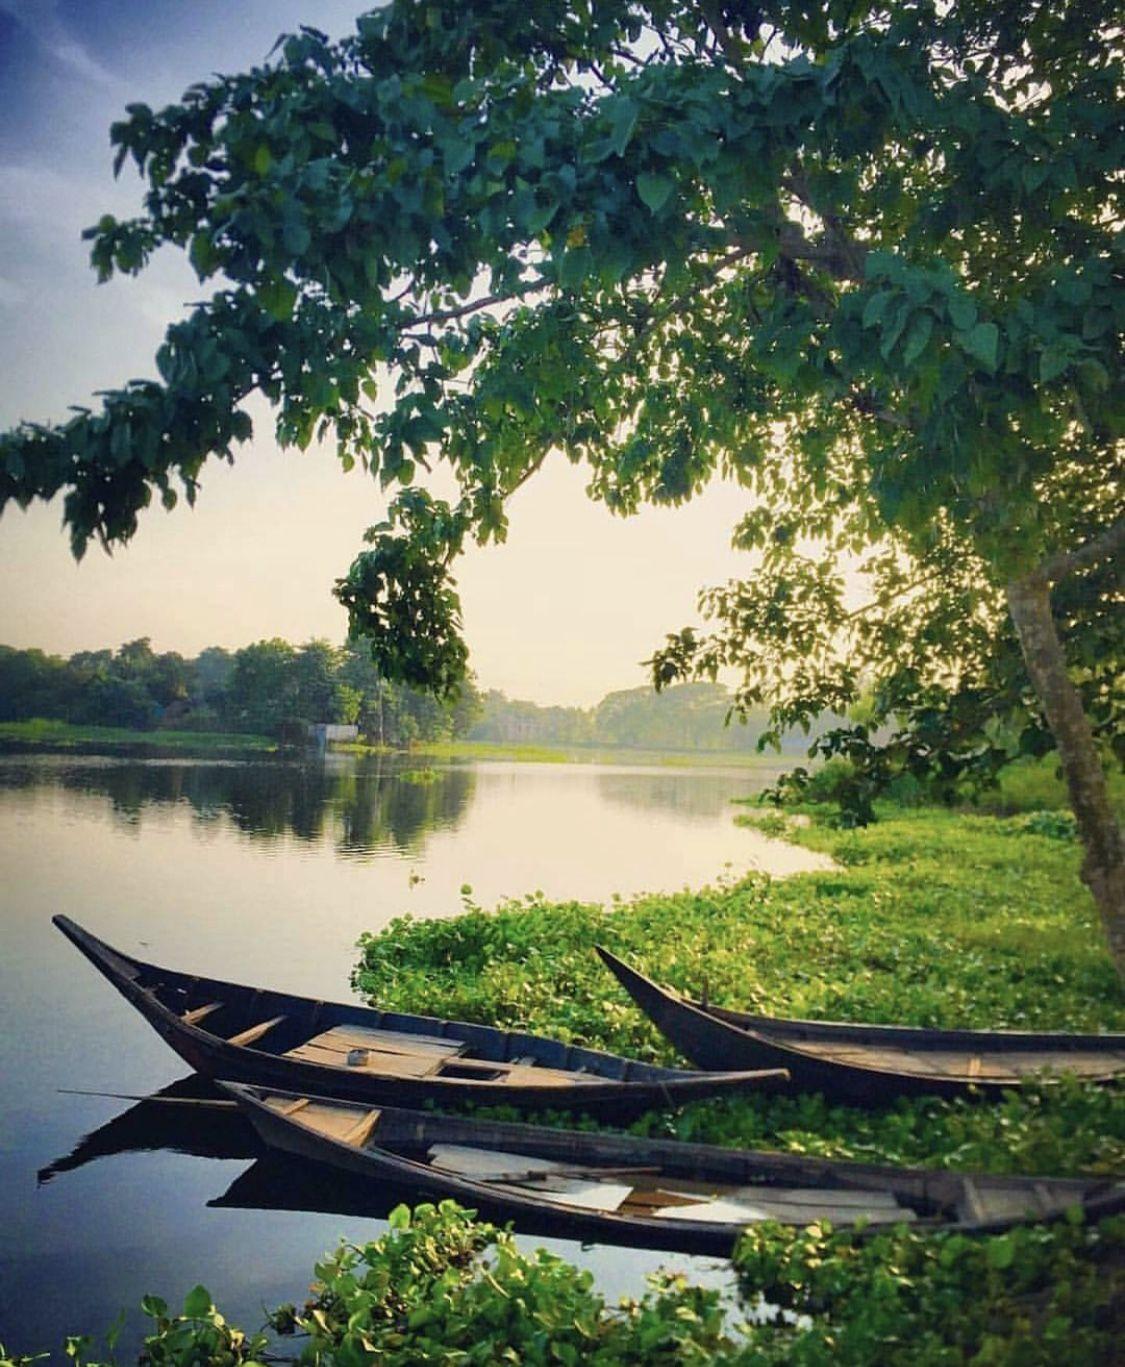 Beautiful Bangladesh Water Boats And Life Travelbangladesh Travellingbangladesh Travel Beautifulbangladesh Explorebangladesh S Paesaggi Fotografia Foto